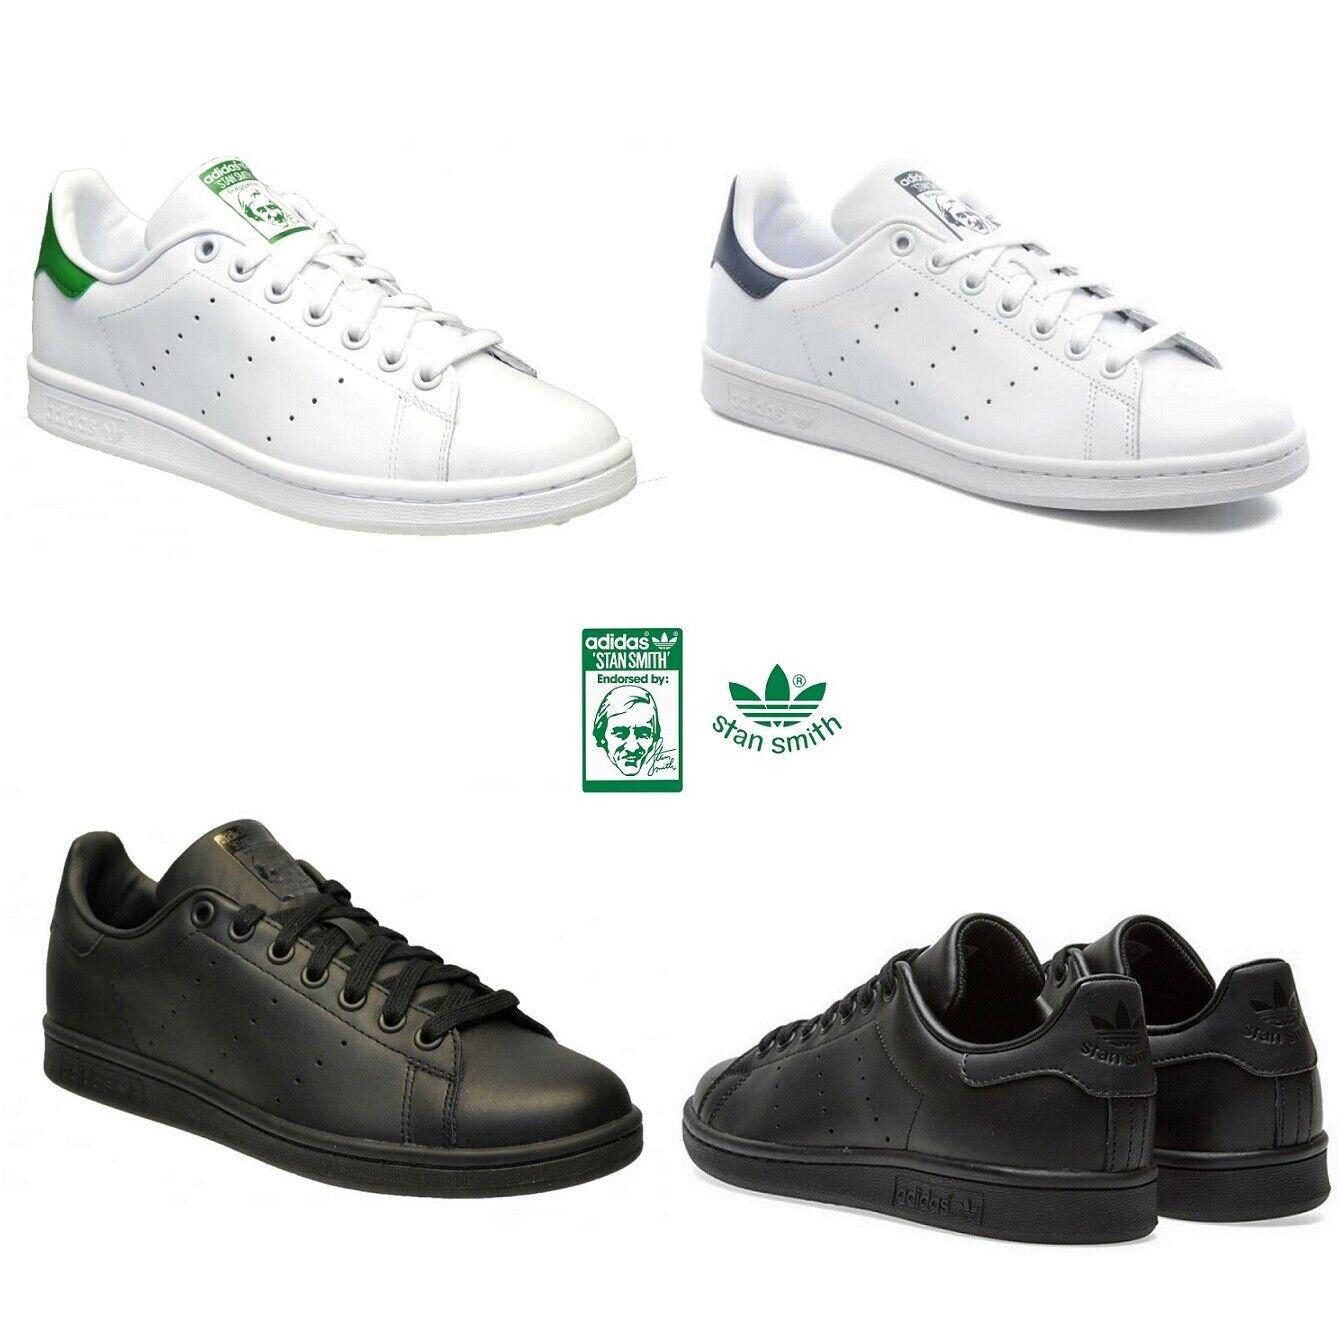 Adidas Tennis Schuhe Pharrell Williams Stan Smith Solar